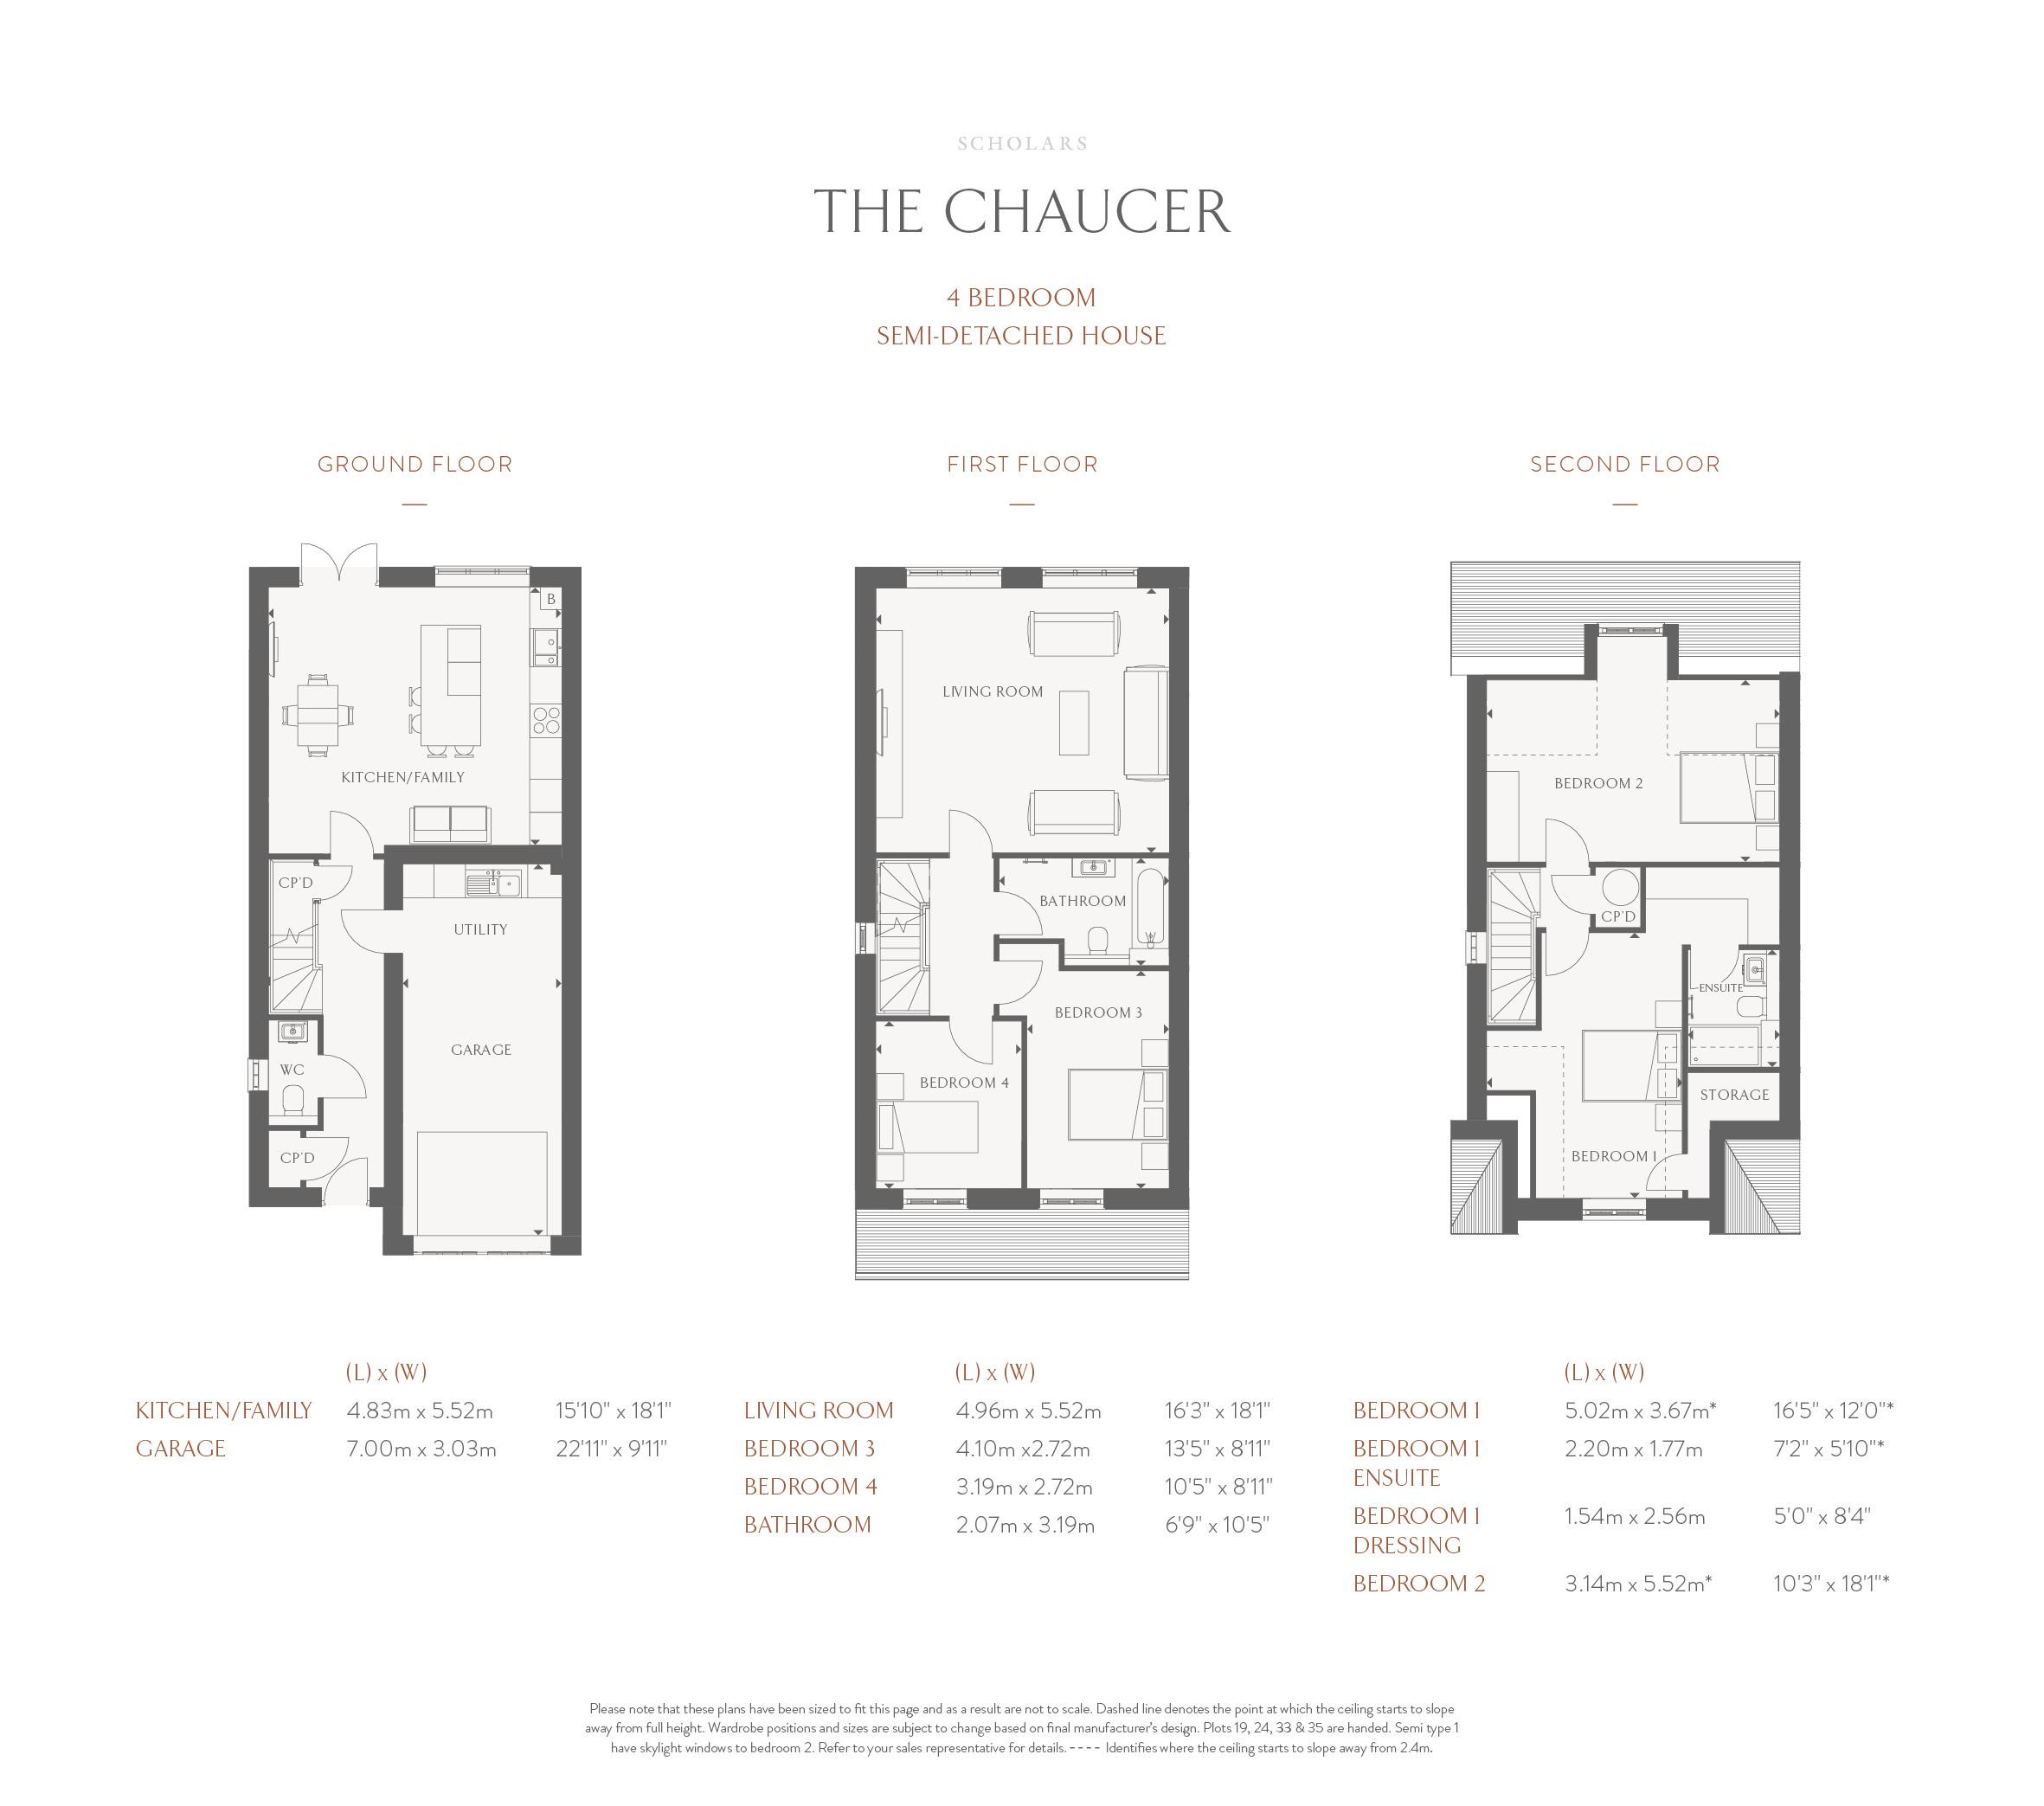 Semi-Detached Floorplan - Chaucer